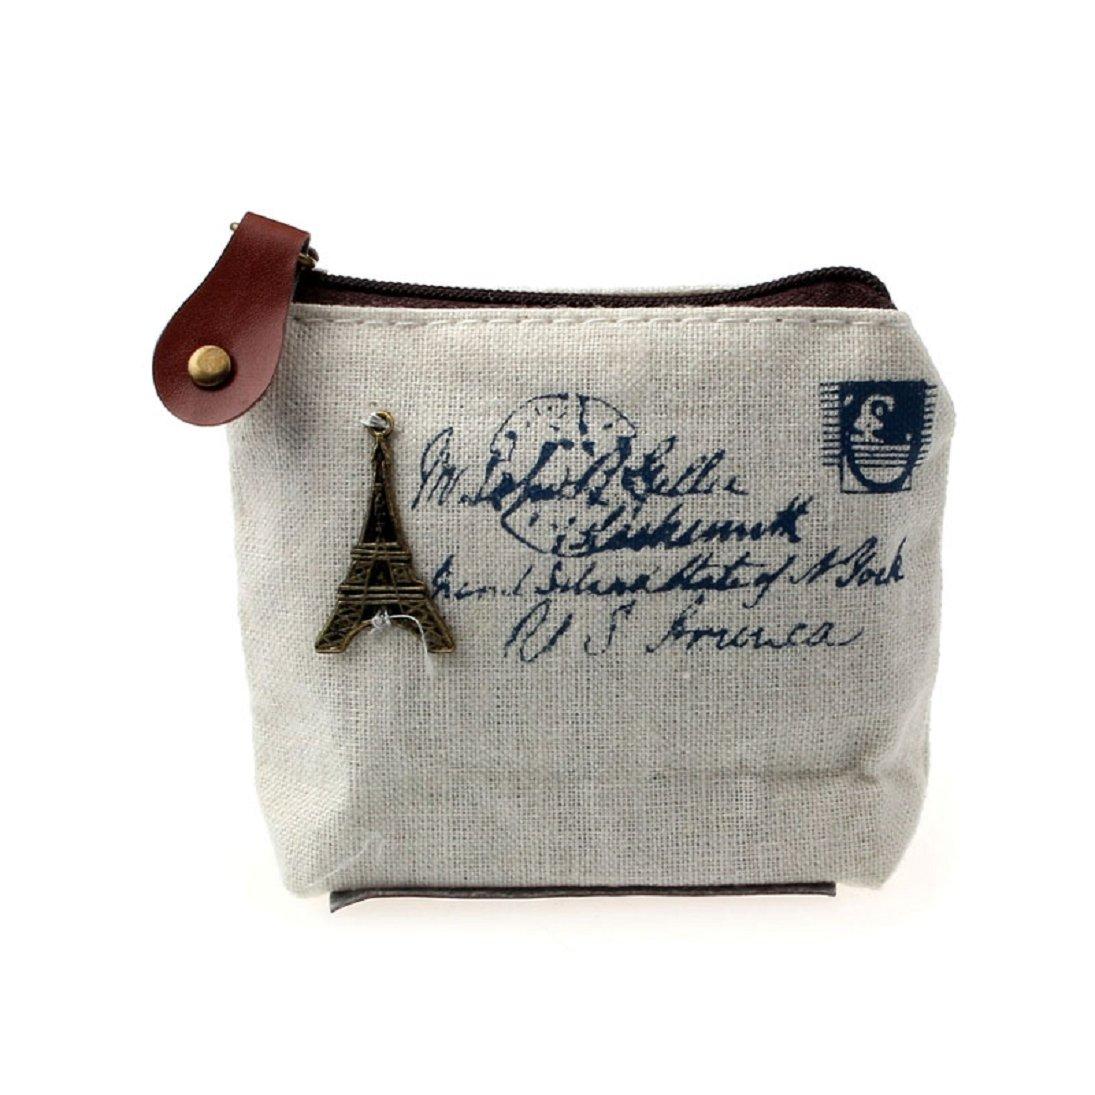 Gallity Women Girls Cute Fashion Change Pouch Key Holder Snacks Coin Purse Wallet Bag (A5)